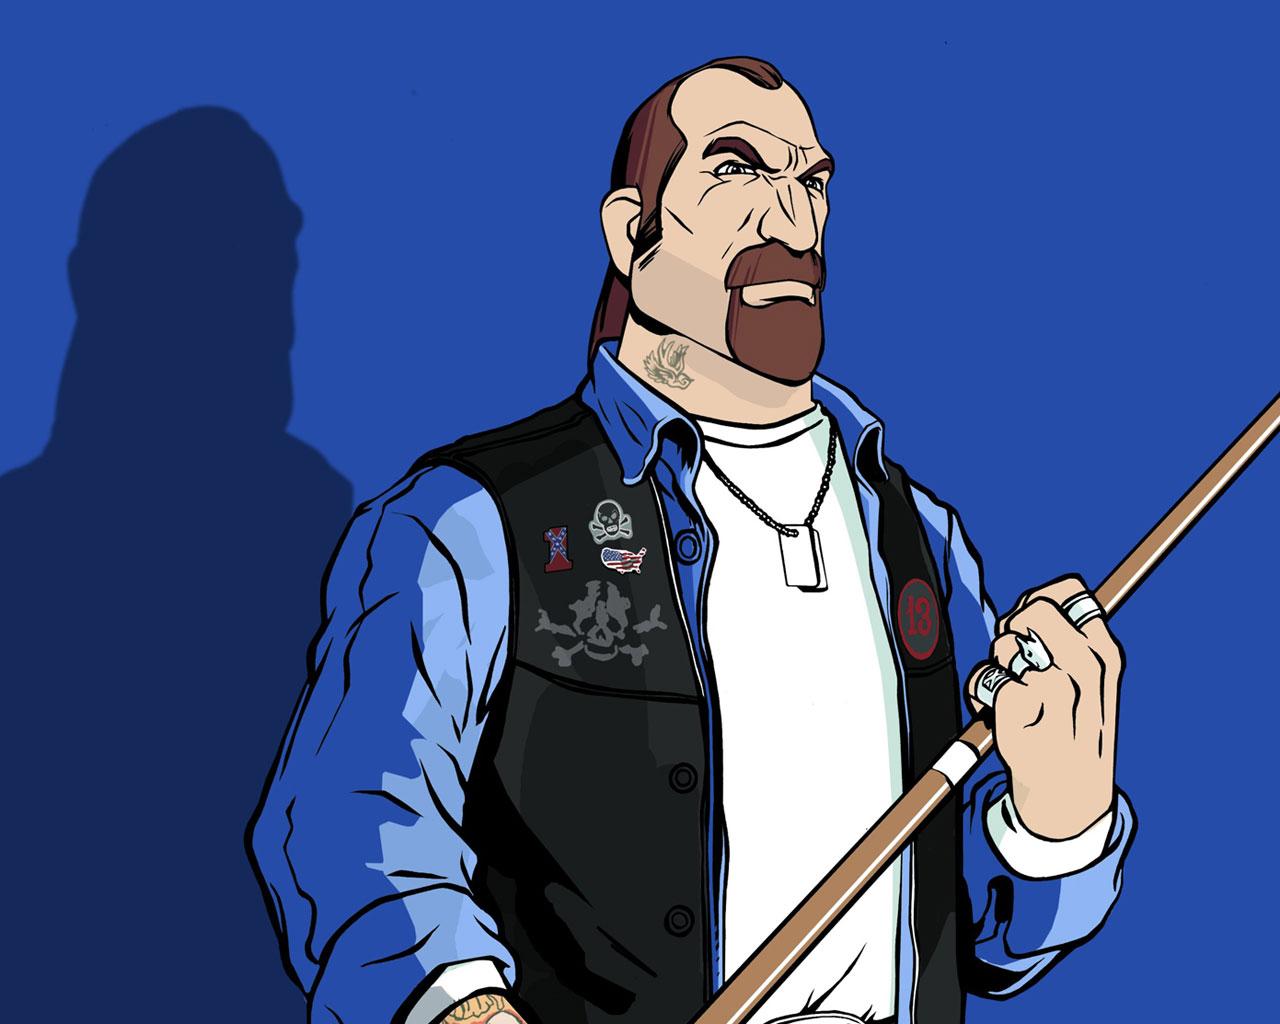 Free Grand Theft Auto: Vice City Wallpaper in 1280x1024